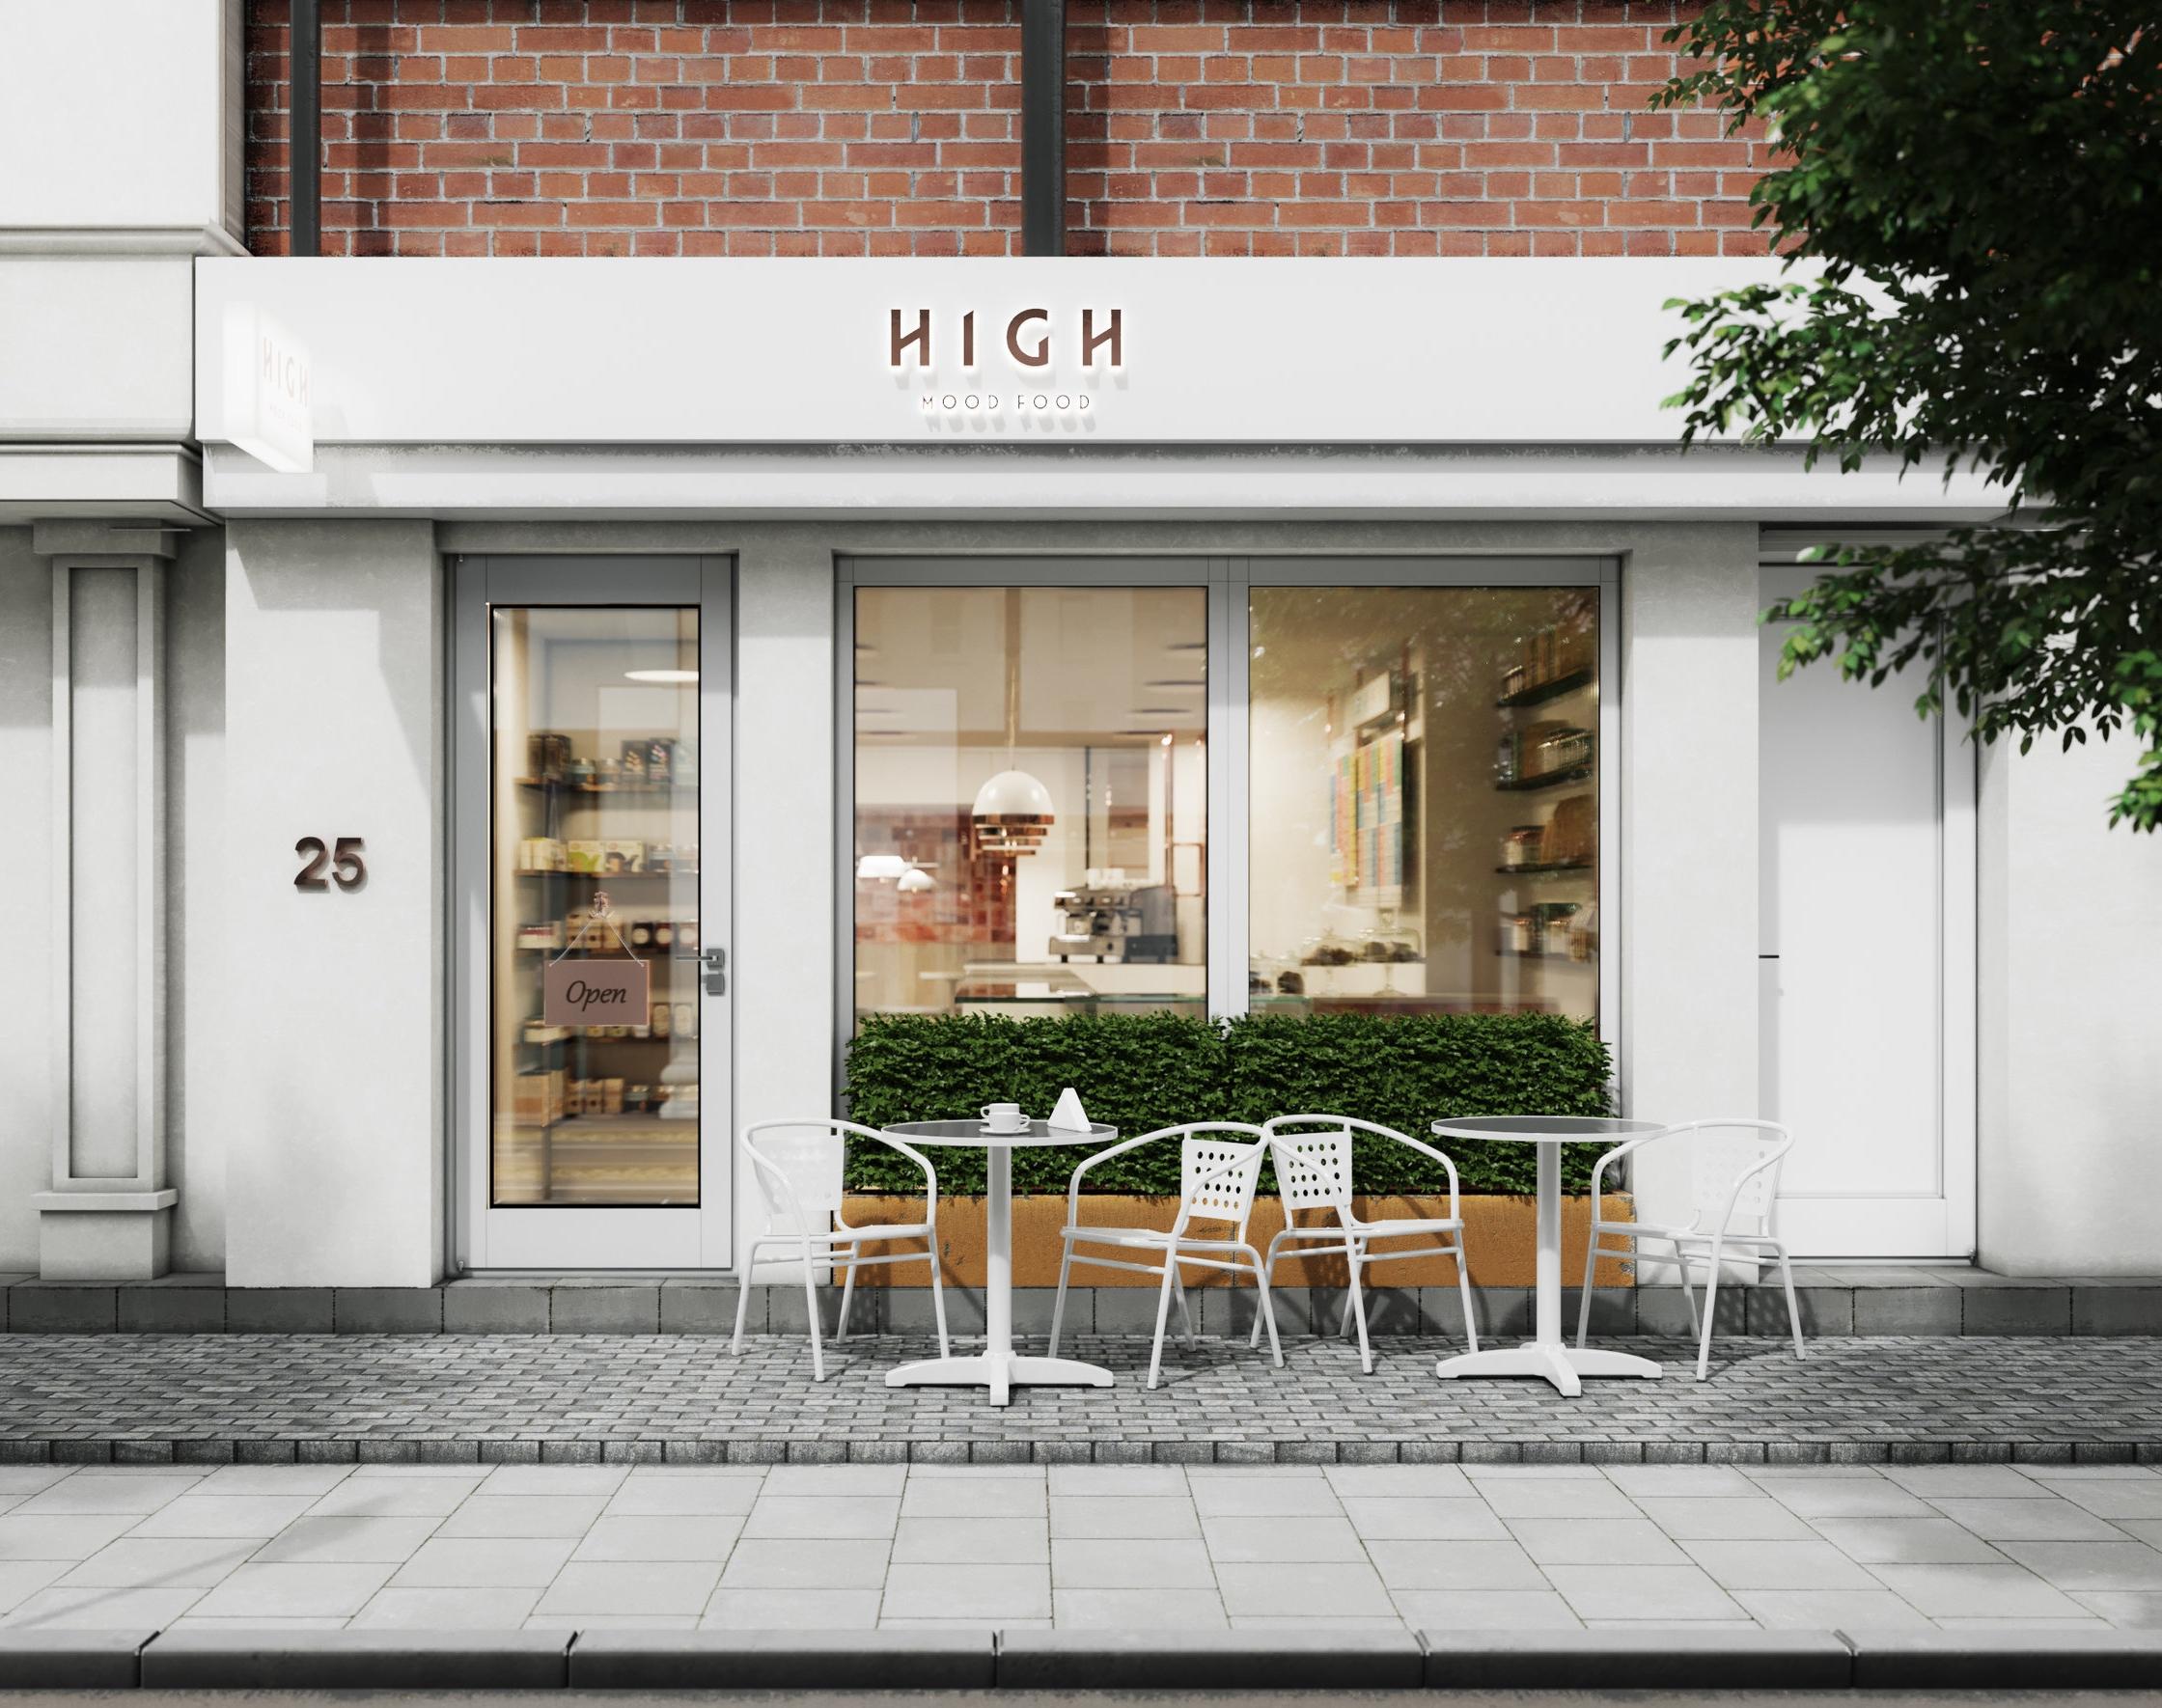 High Mood Food_Exterior Render